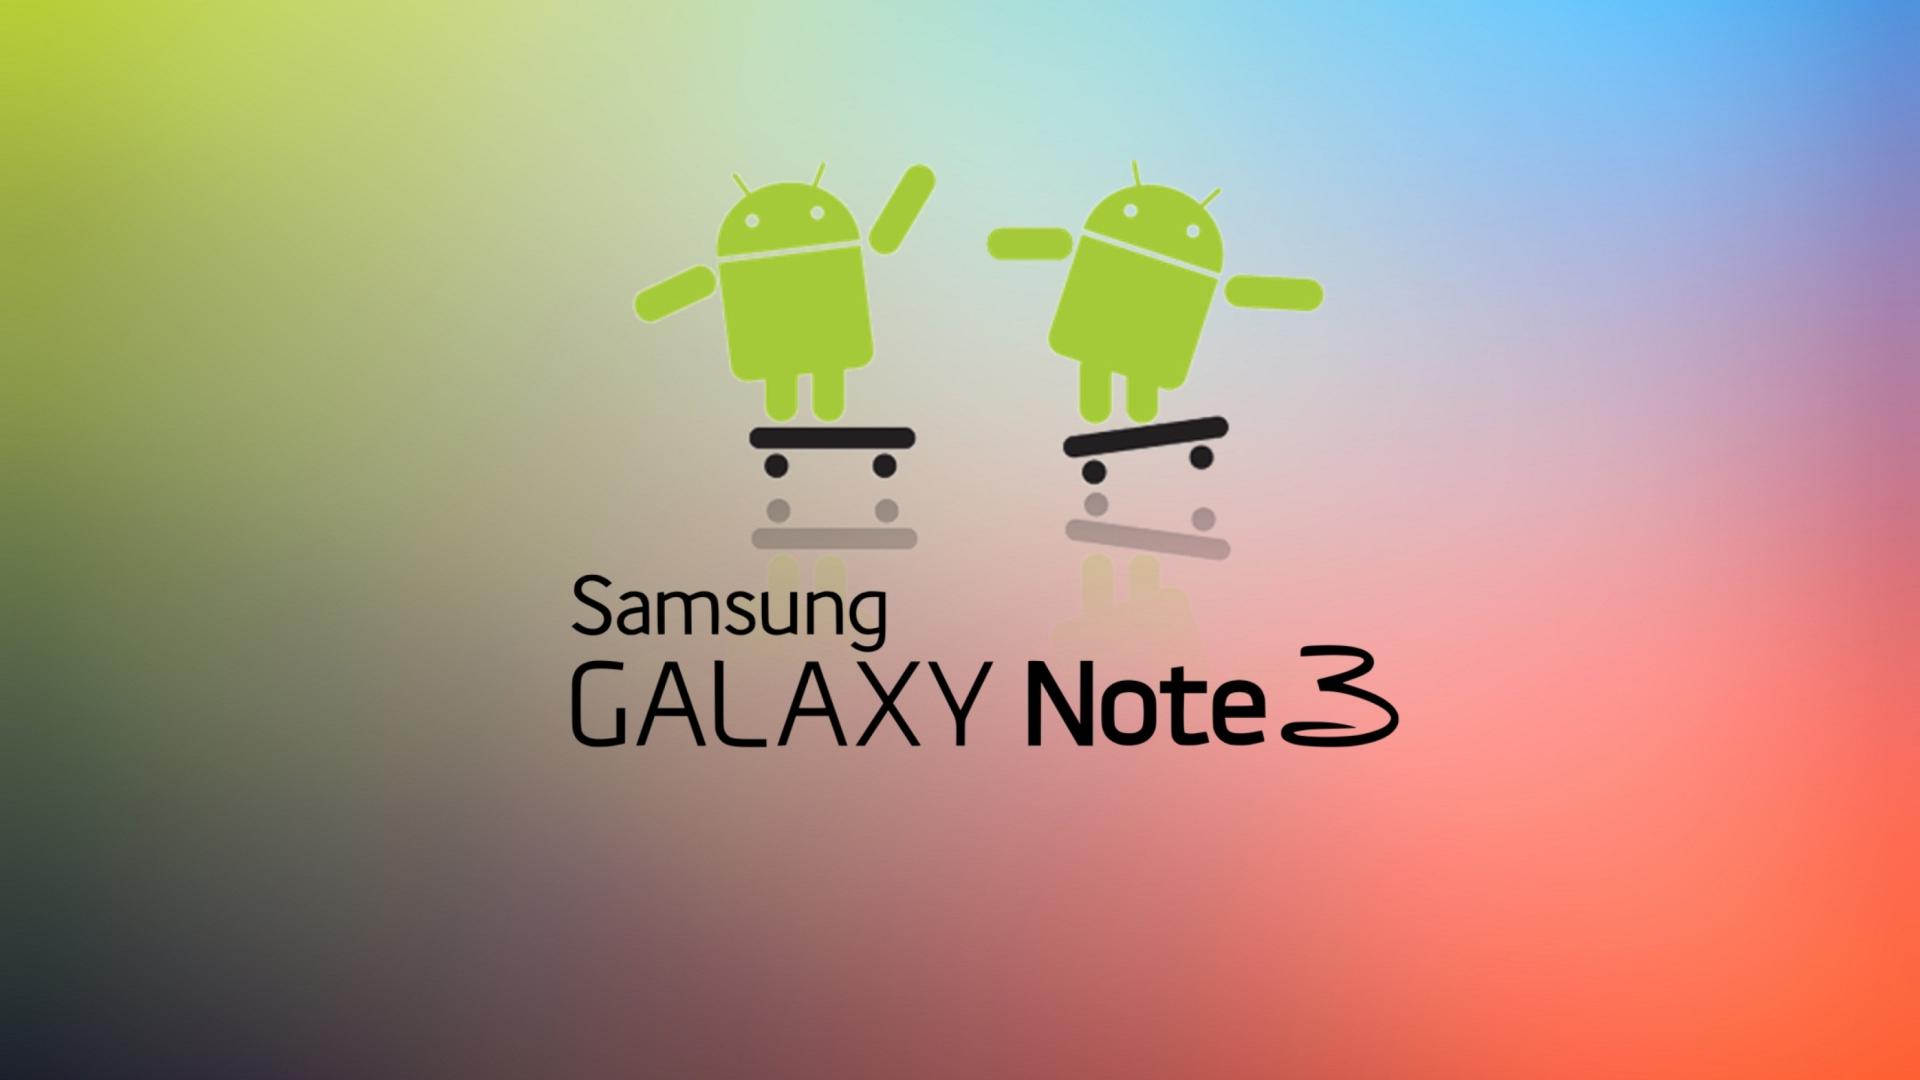 samsung galaxy note 3 wallpaper for desktop 1920x1080 full hd